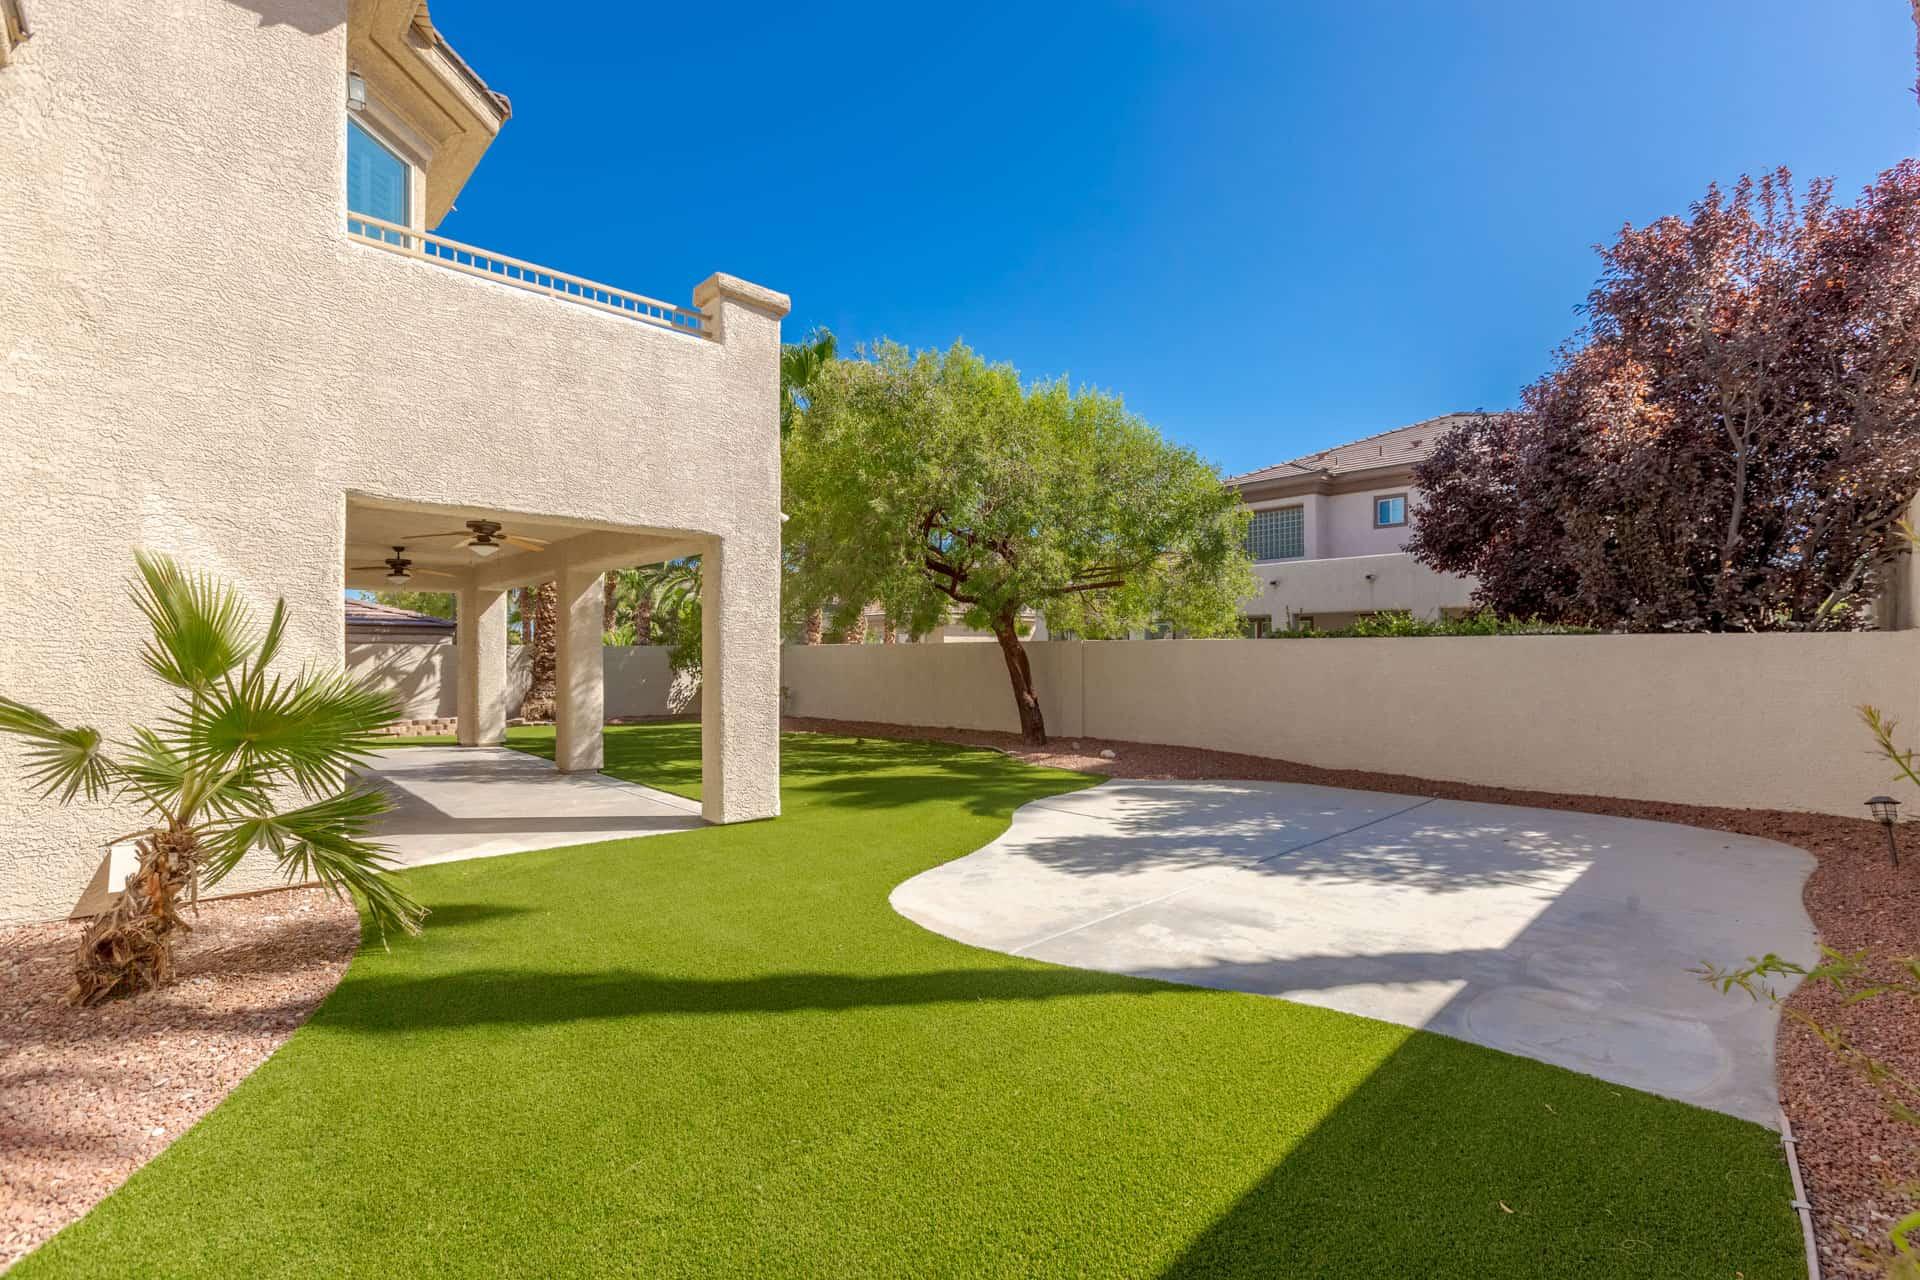 las-vegas-luxry-real-estate-realtor-rob-jensen-company-10729-grey-havens-court-willow-creek5657